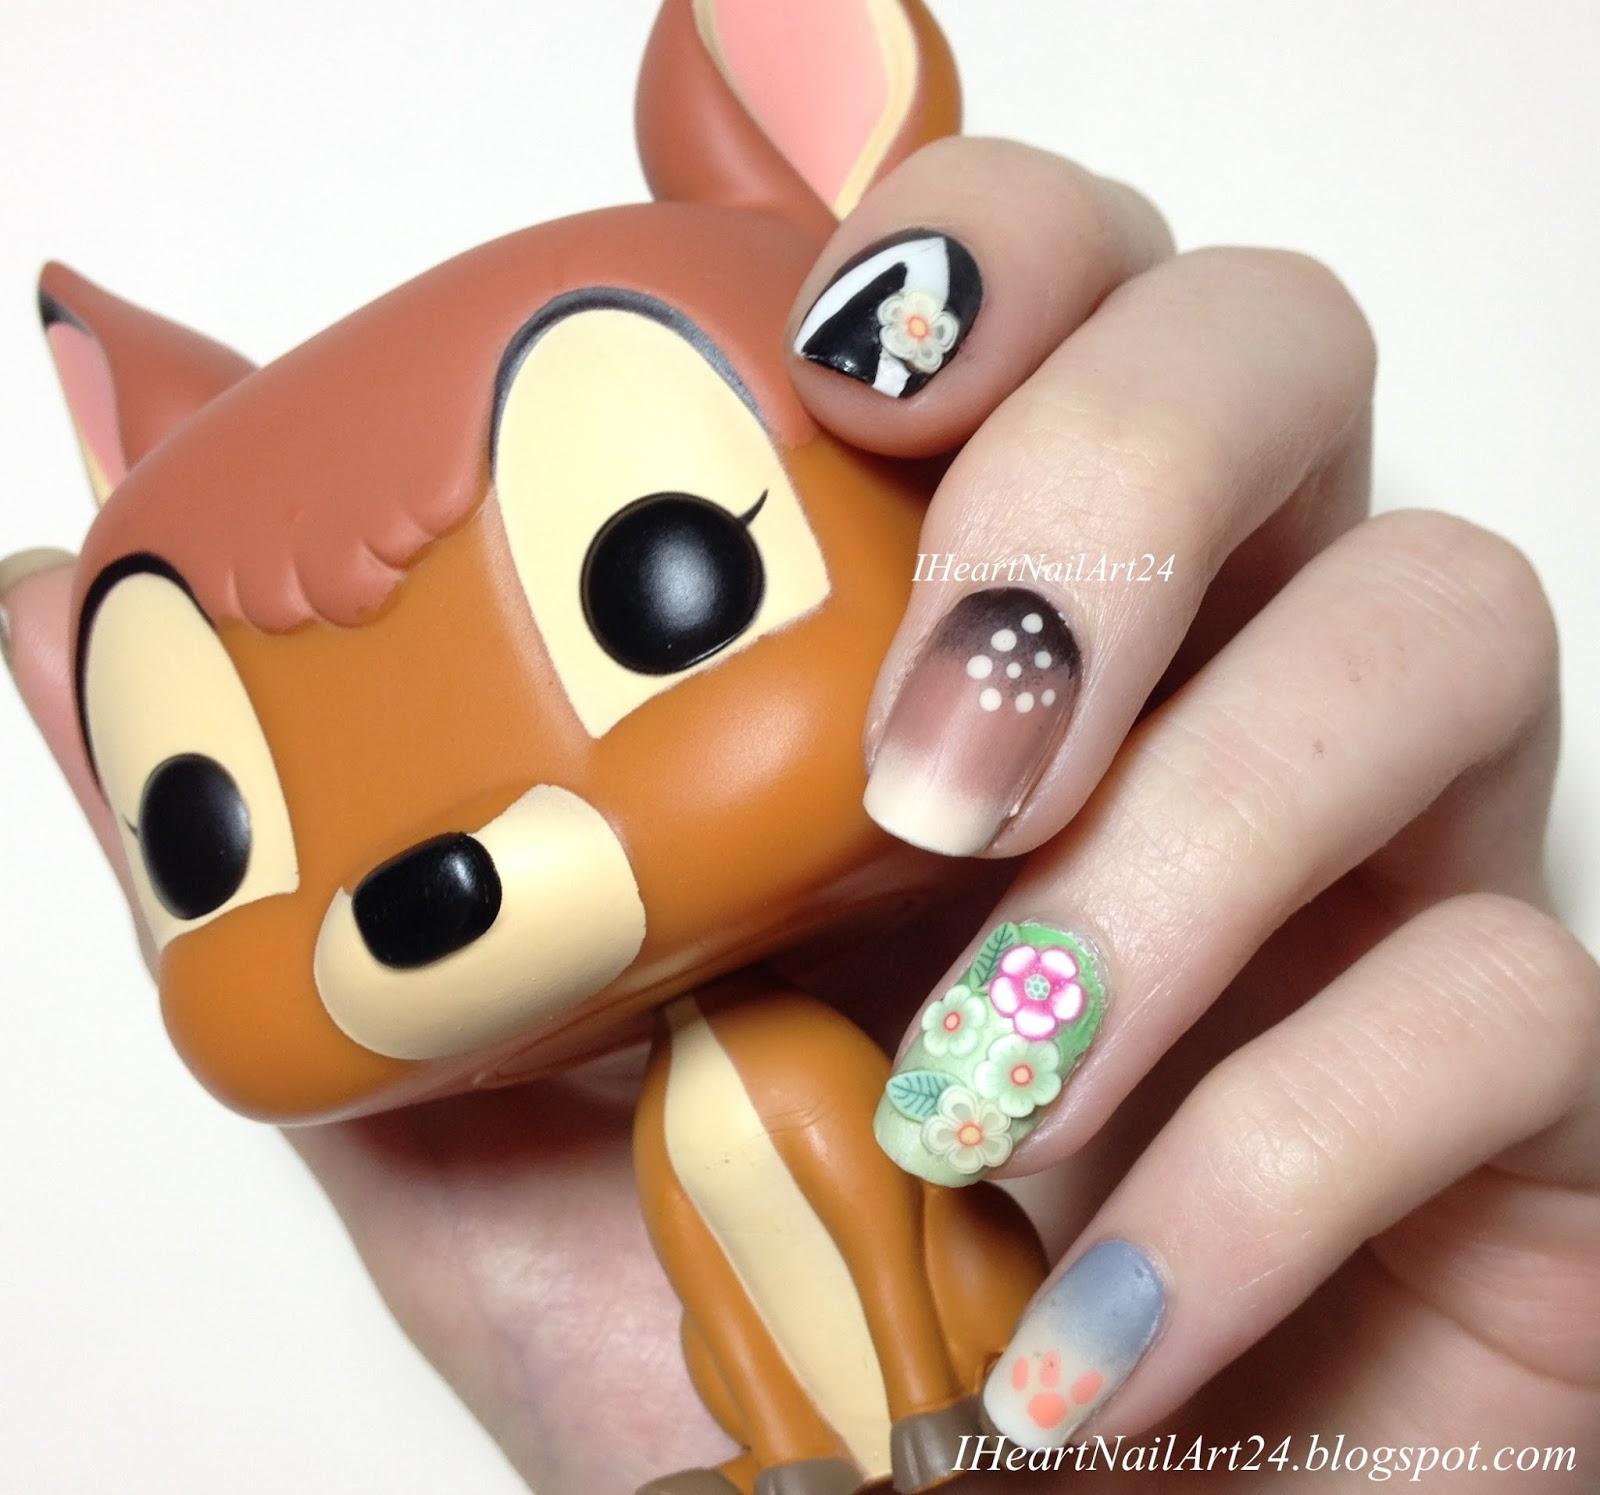 Bambi Nail Art | I Heart Nail Art